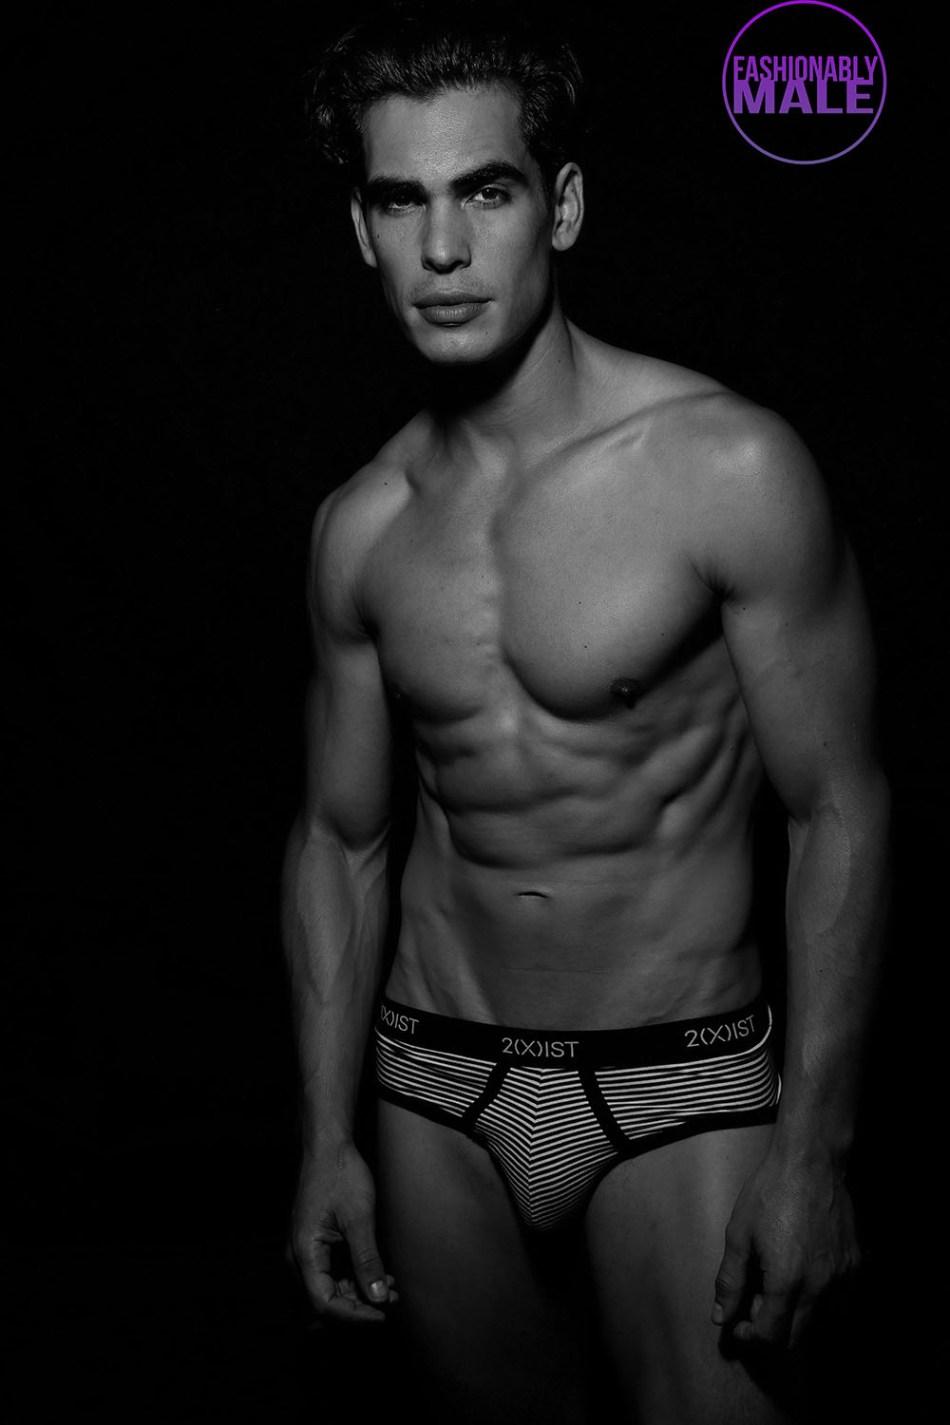 Felipe Villagrana by Afif Kattan for Fashionably Male4